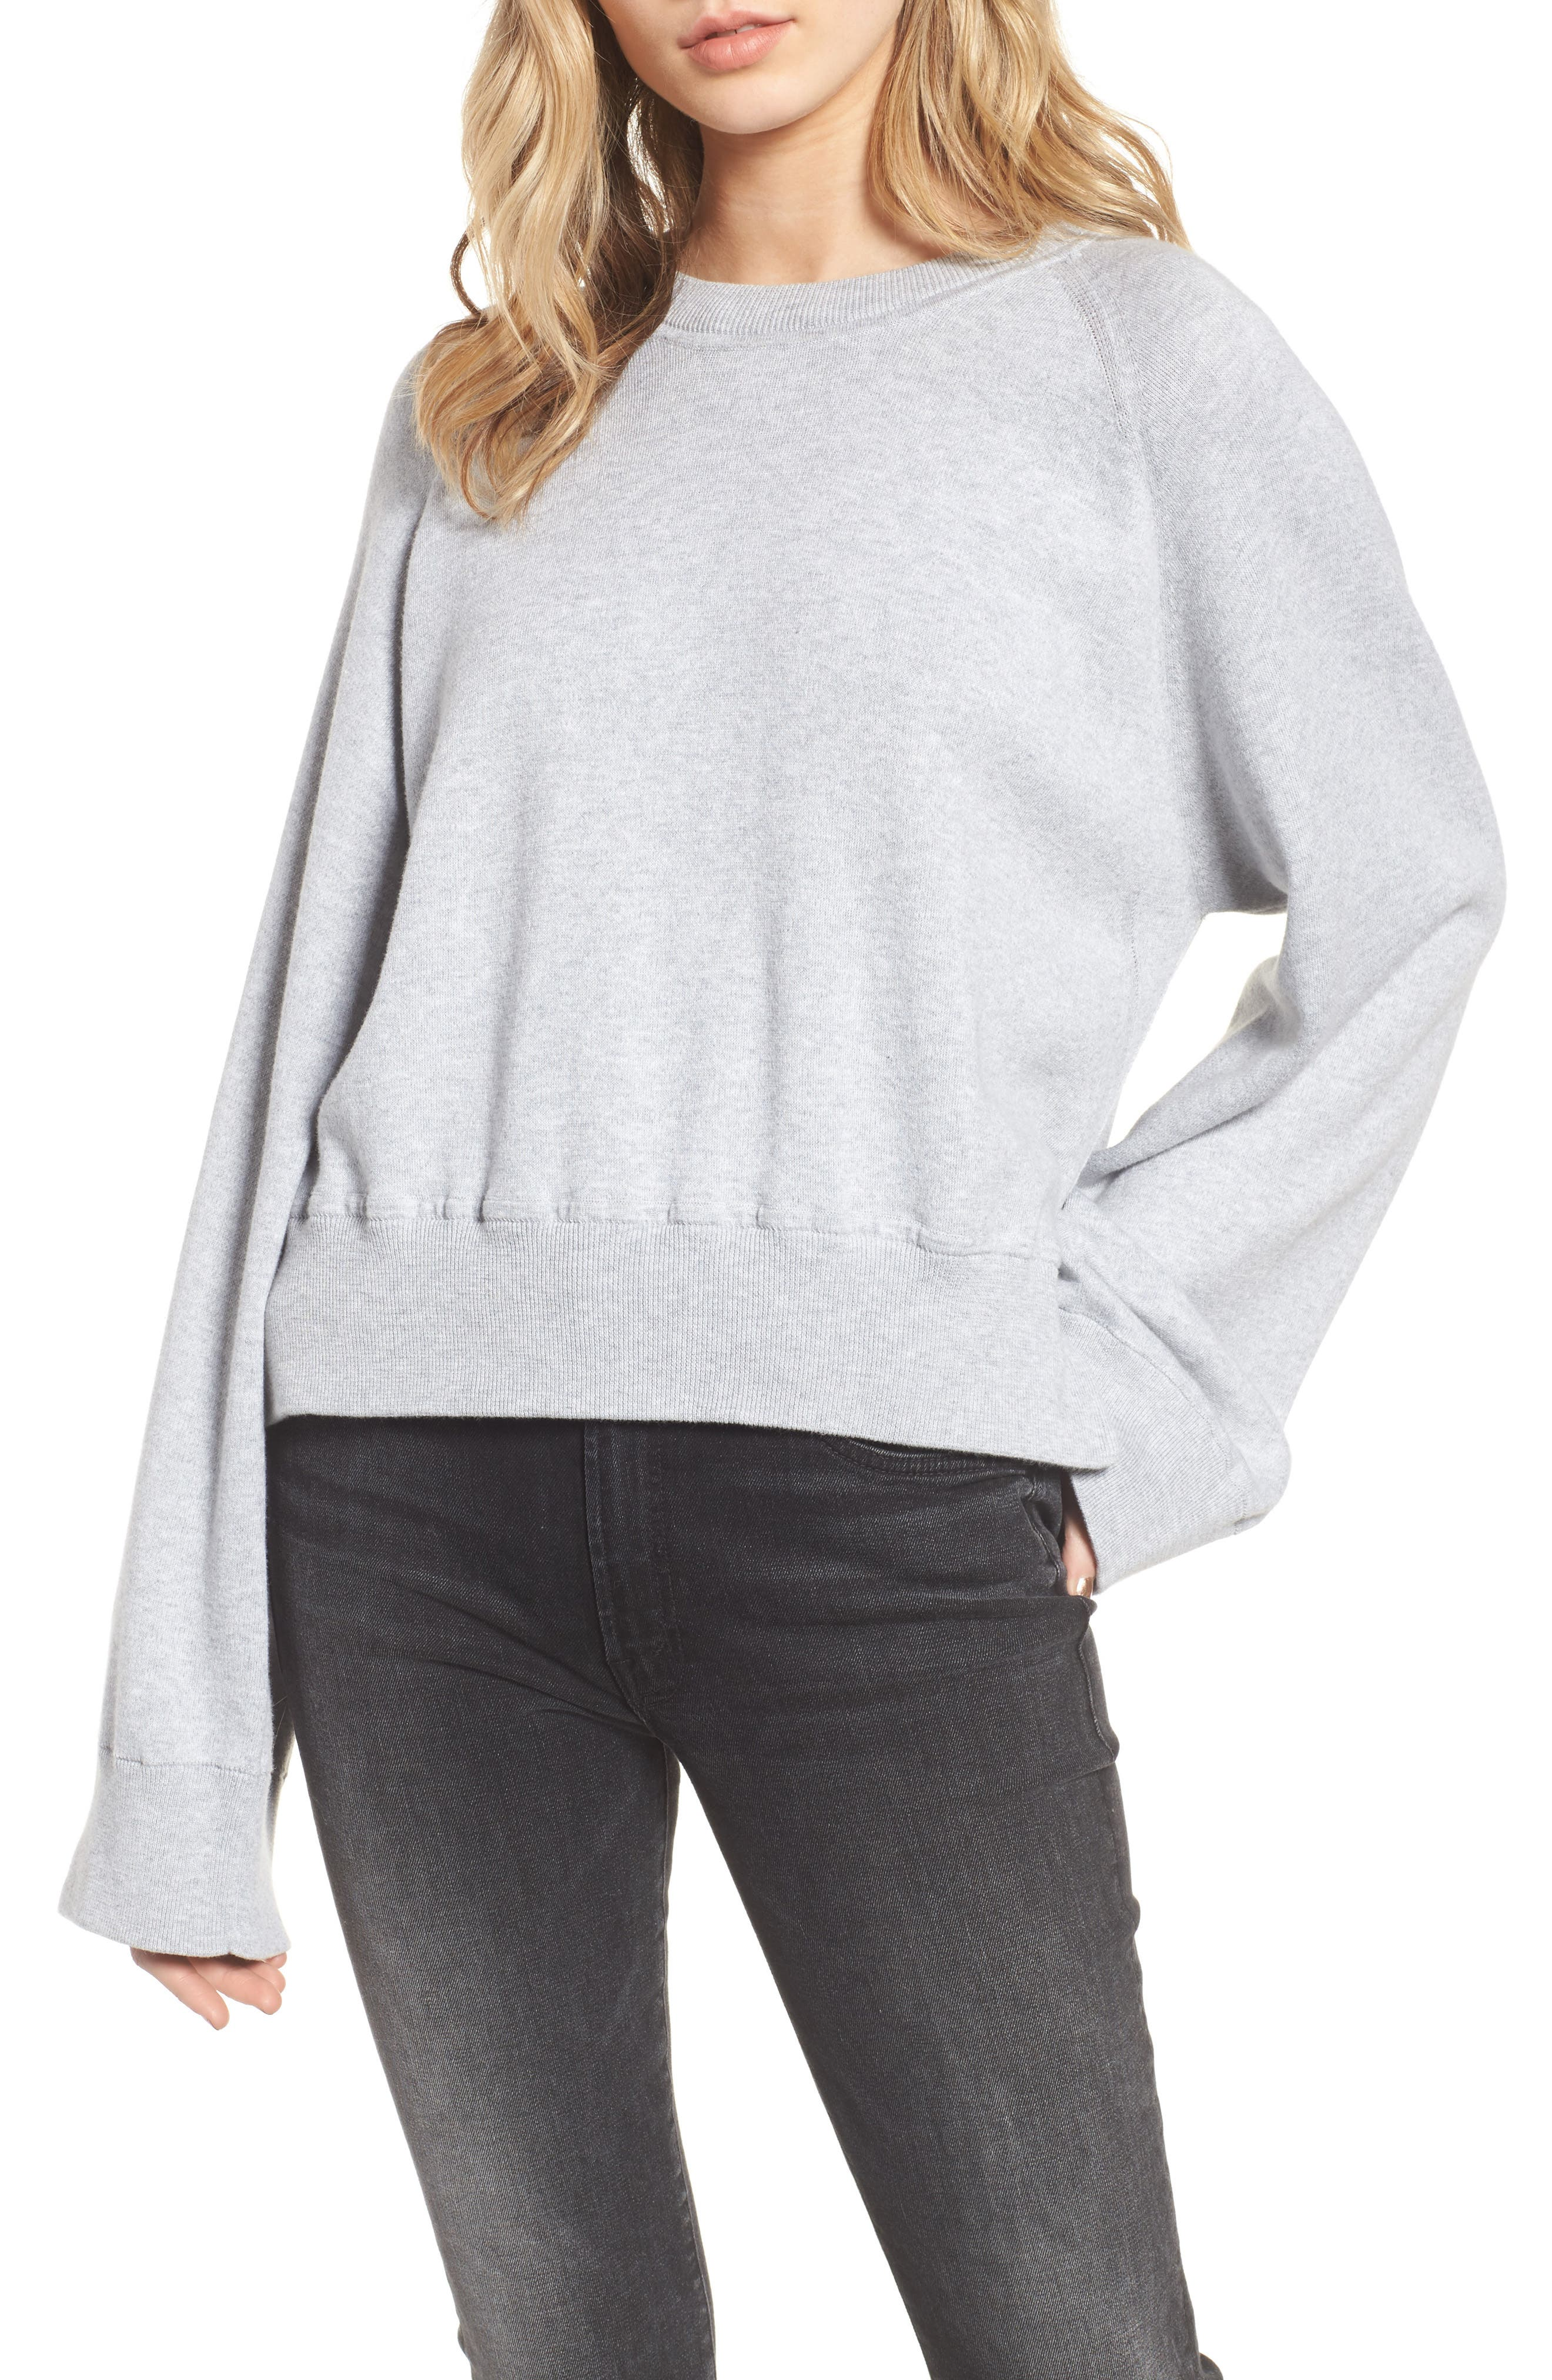 Lea Sweatshirt,                         Main,                         color,